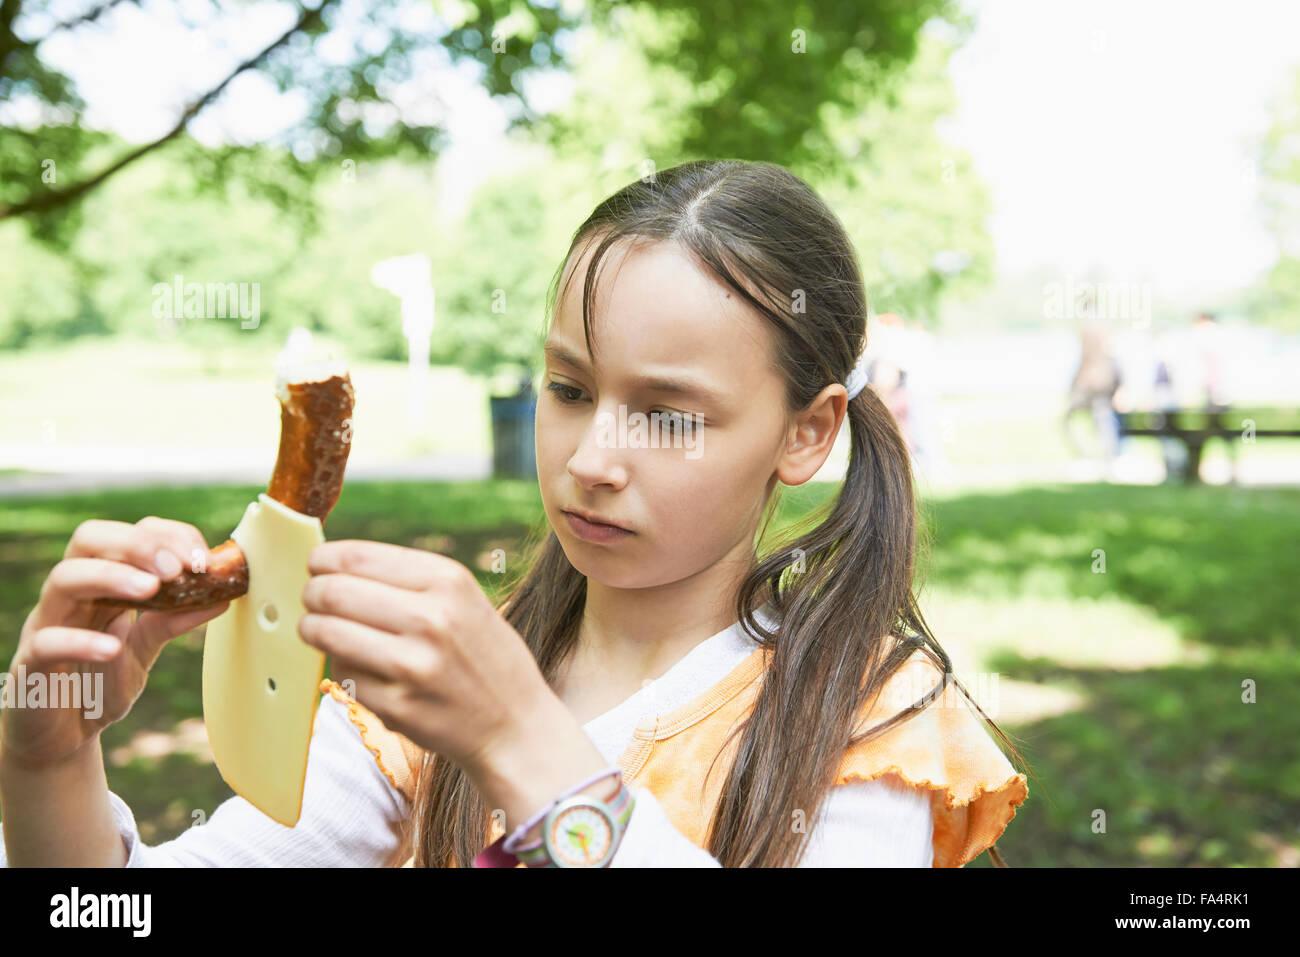 Girl inserting sausage into cheese, Munich, Bavaria, Germany - Stock Image